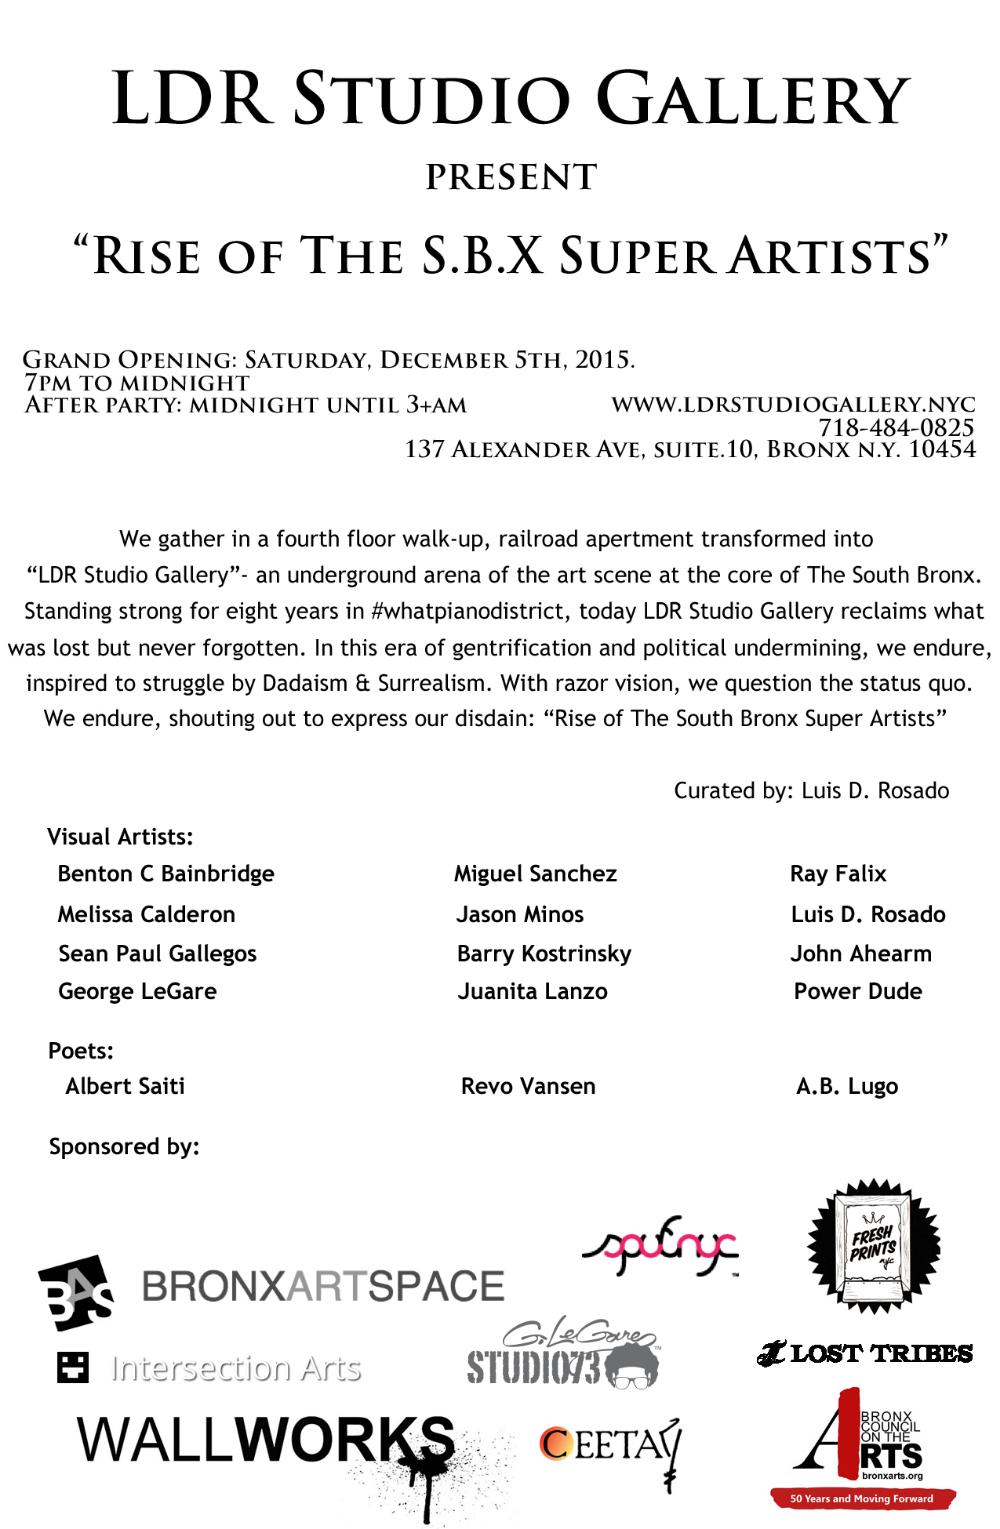 Rise of The S.B.X Super Artists PostCard.jpg